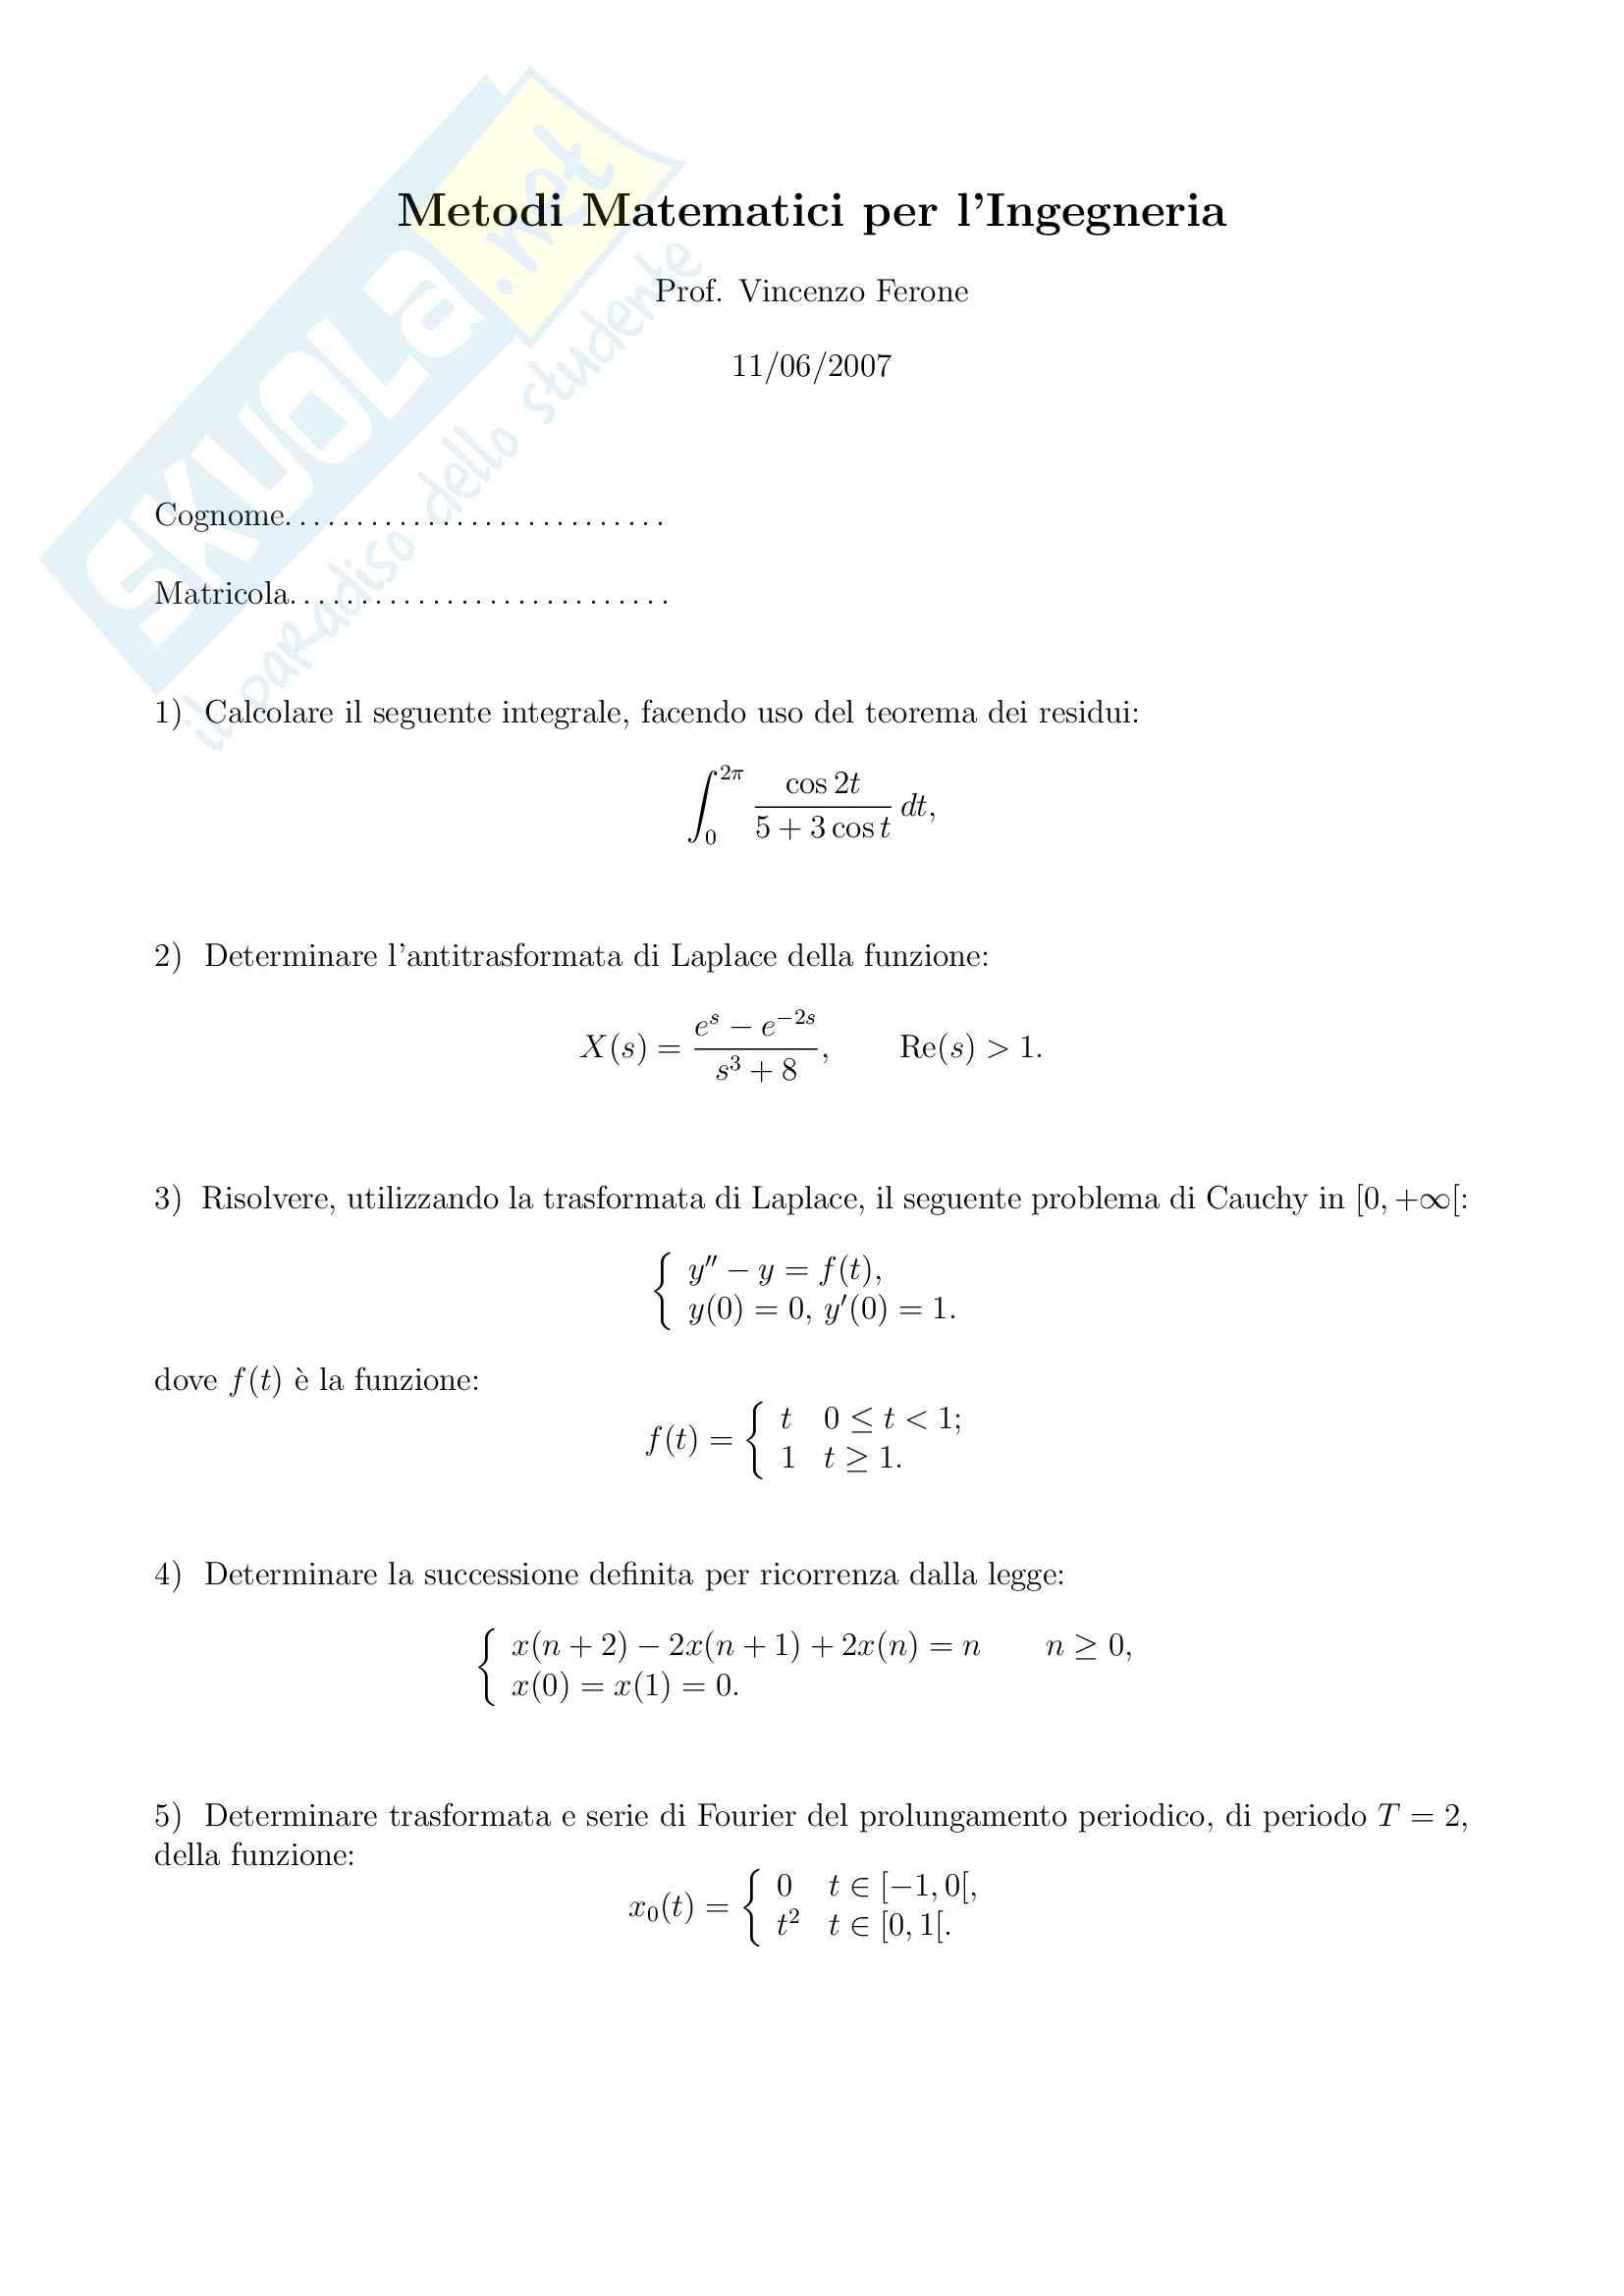 Metodi matematici per l'ingegneria - Vari esercizi